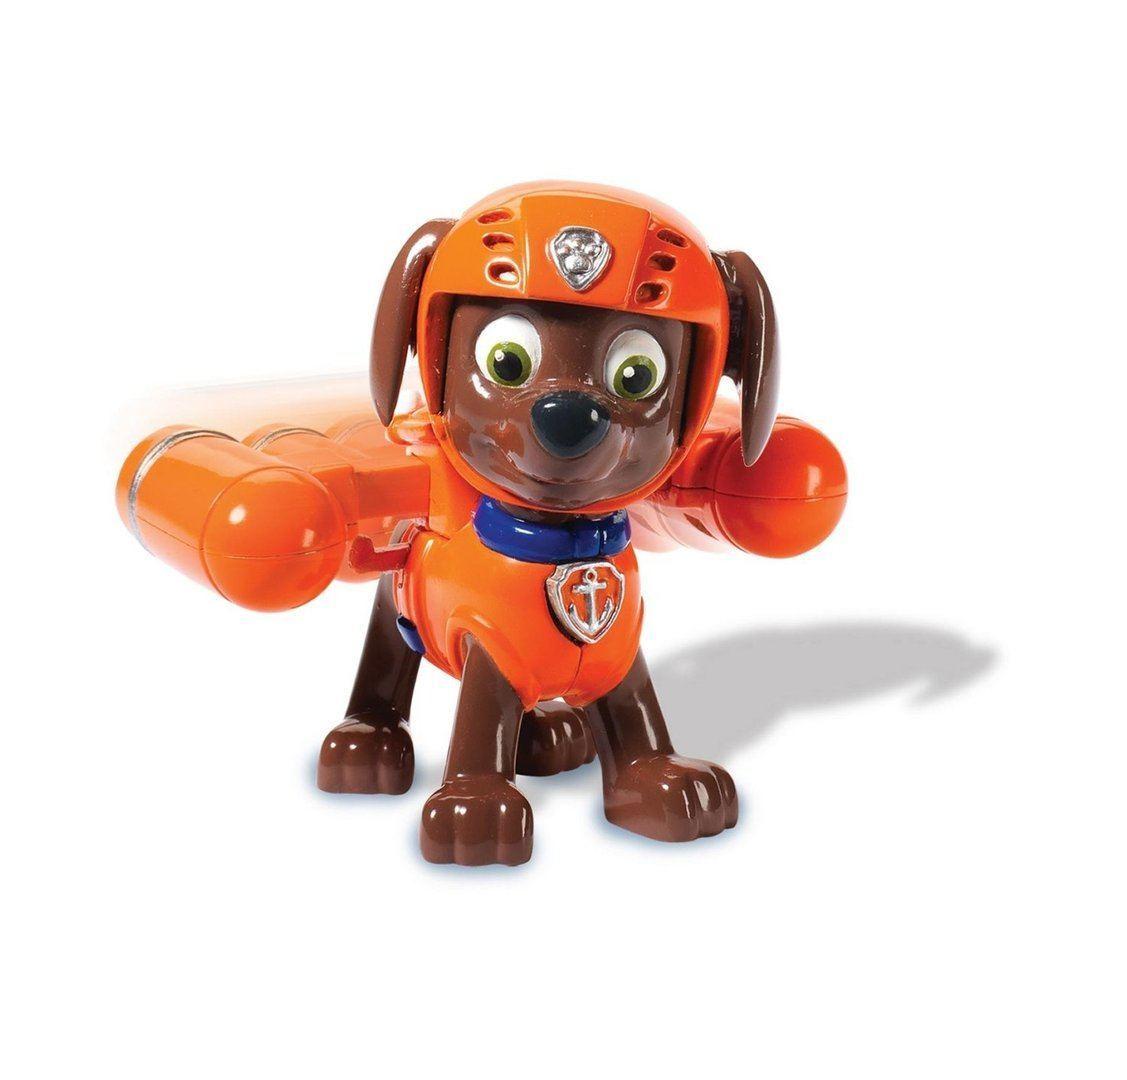 muneco-zuma-patrulla-canina